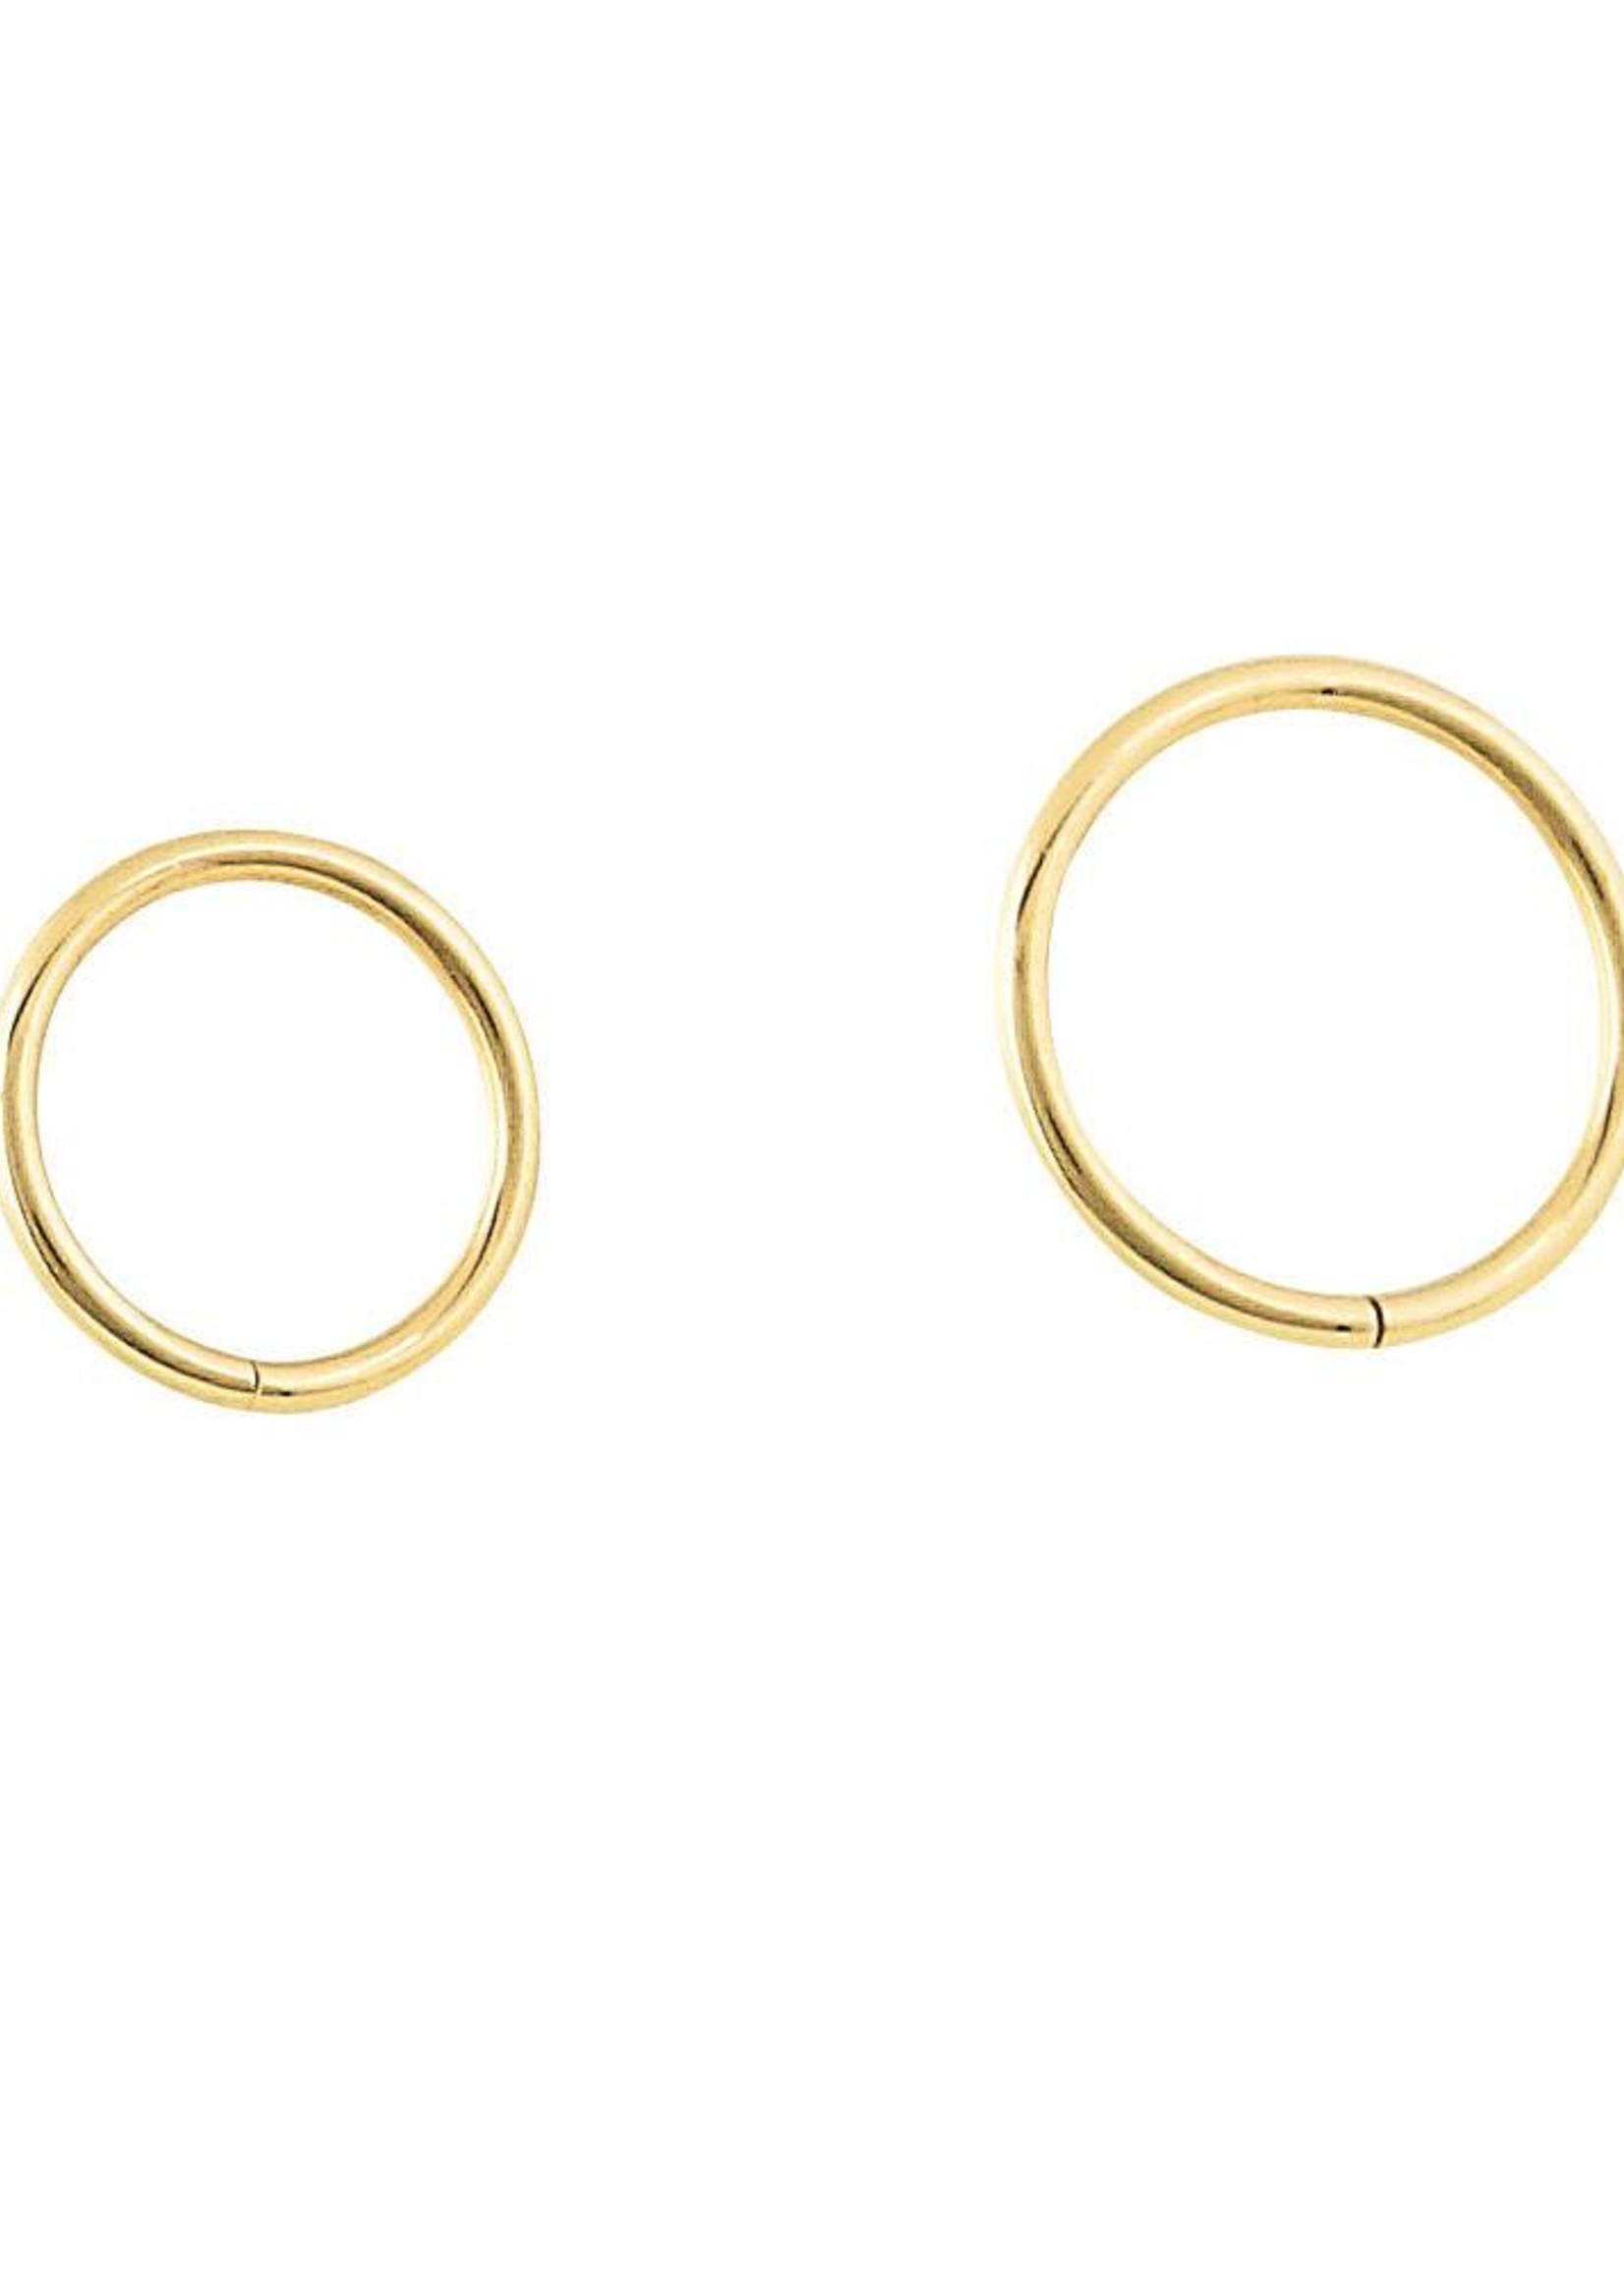 20g 14k Seam Rings